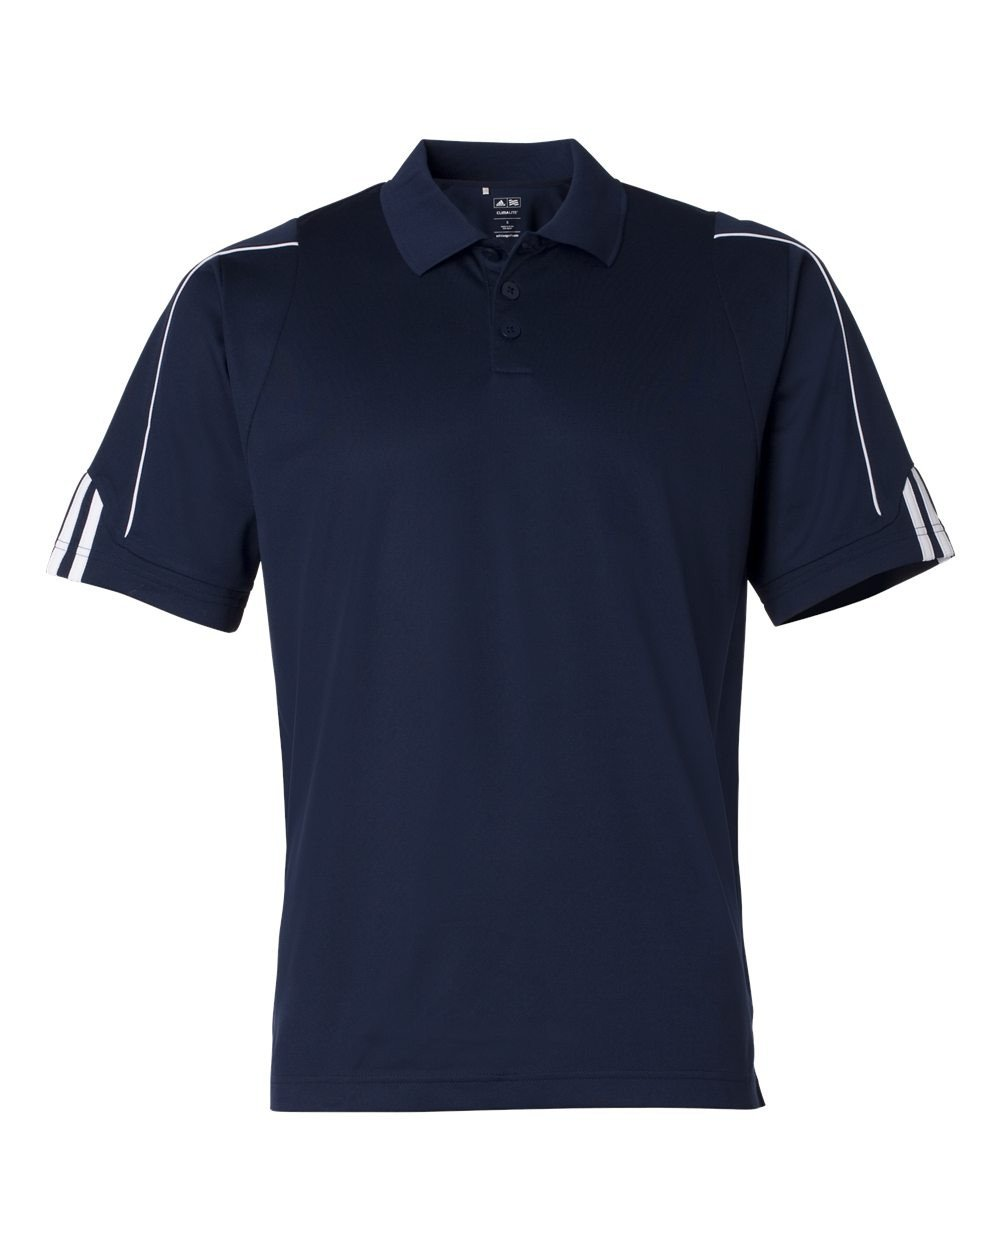 Adidas Men's ClimaLite 3-Stripes Cuff